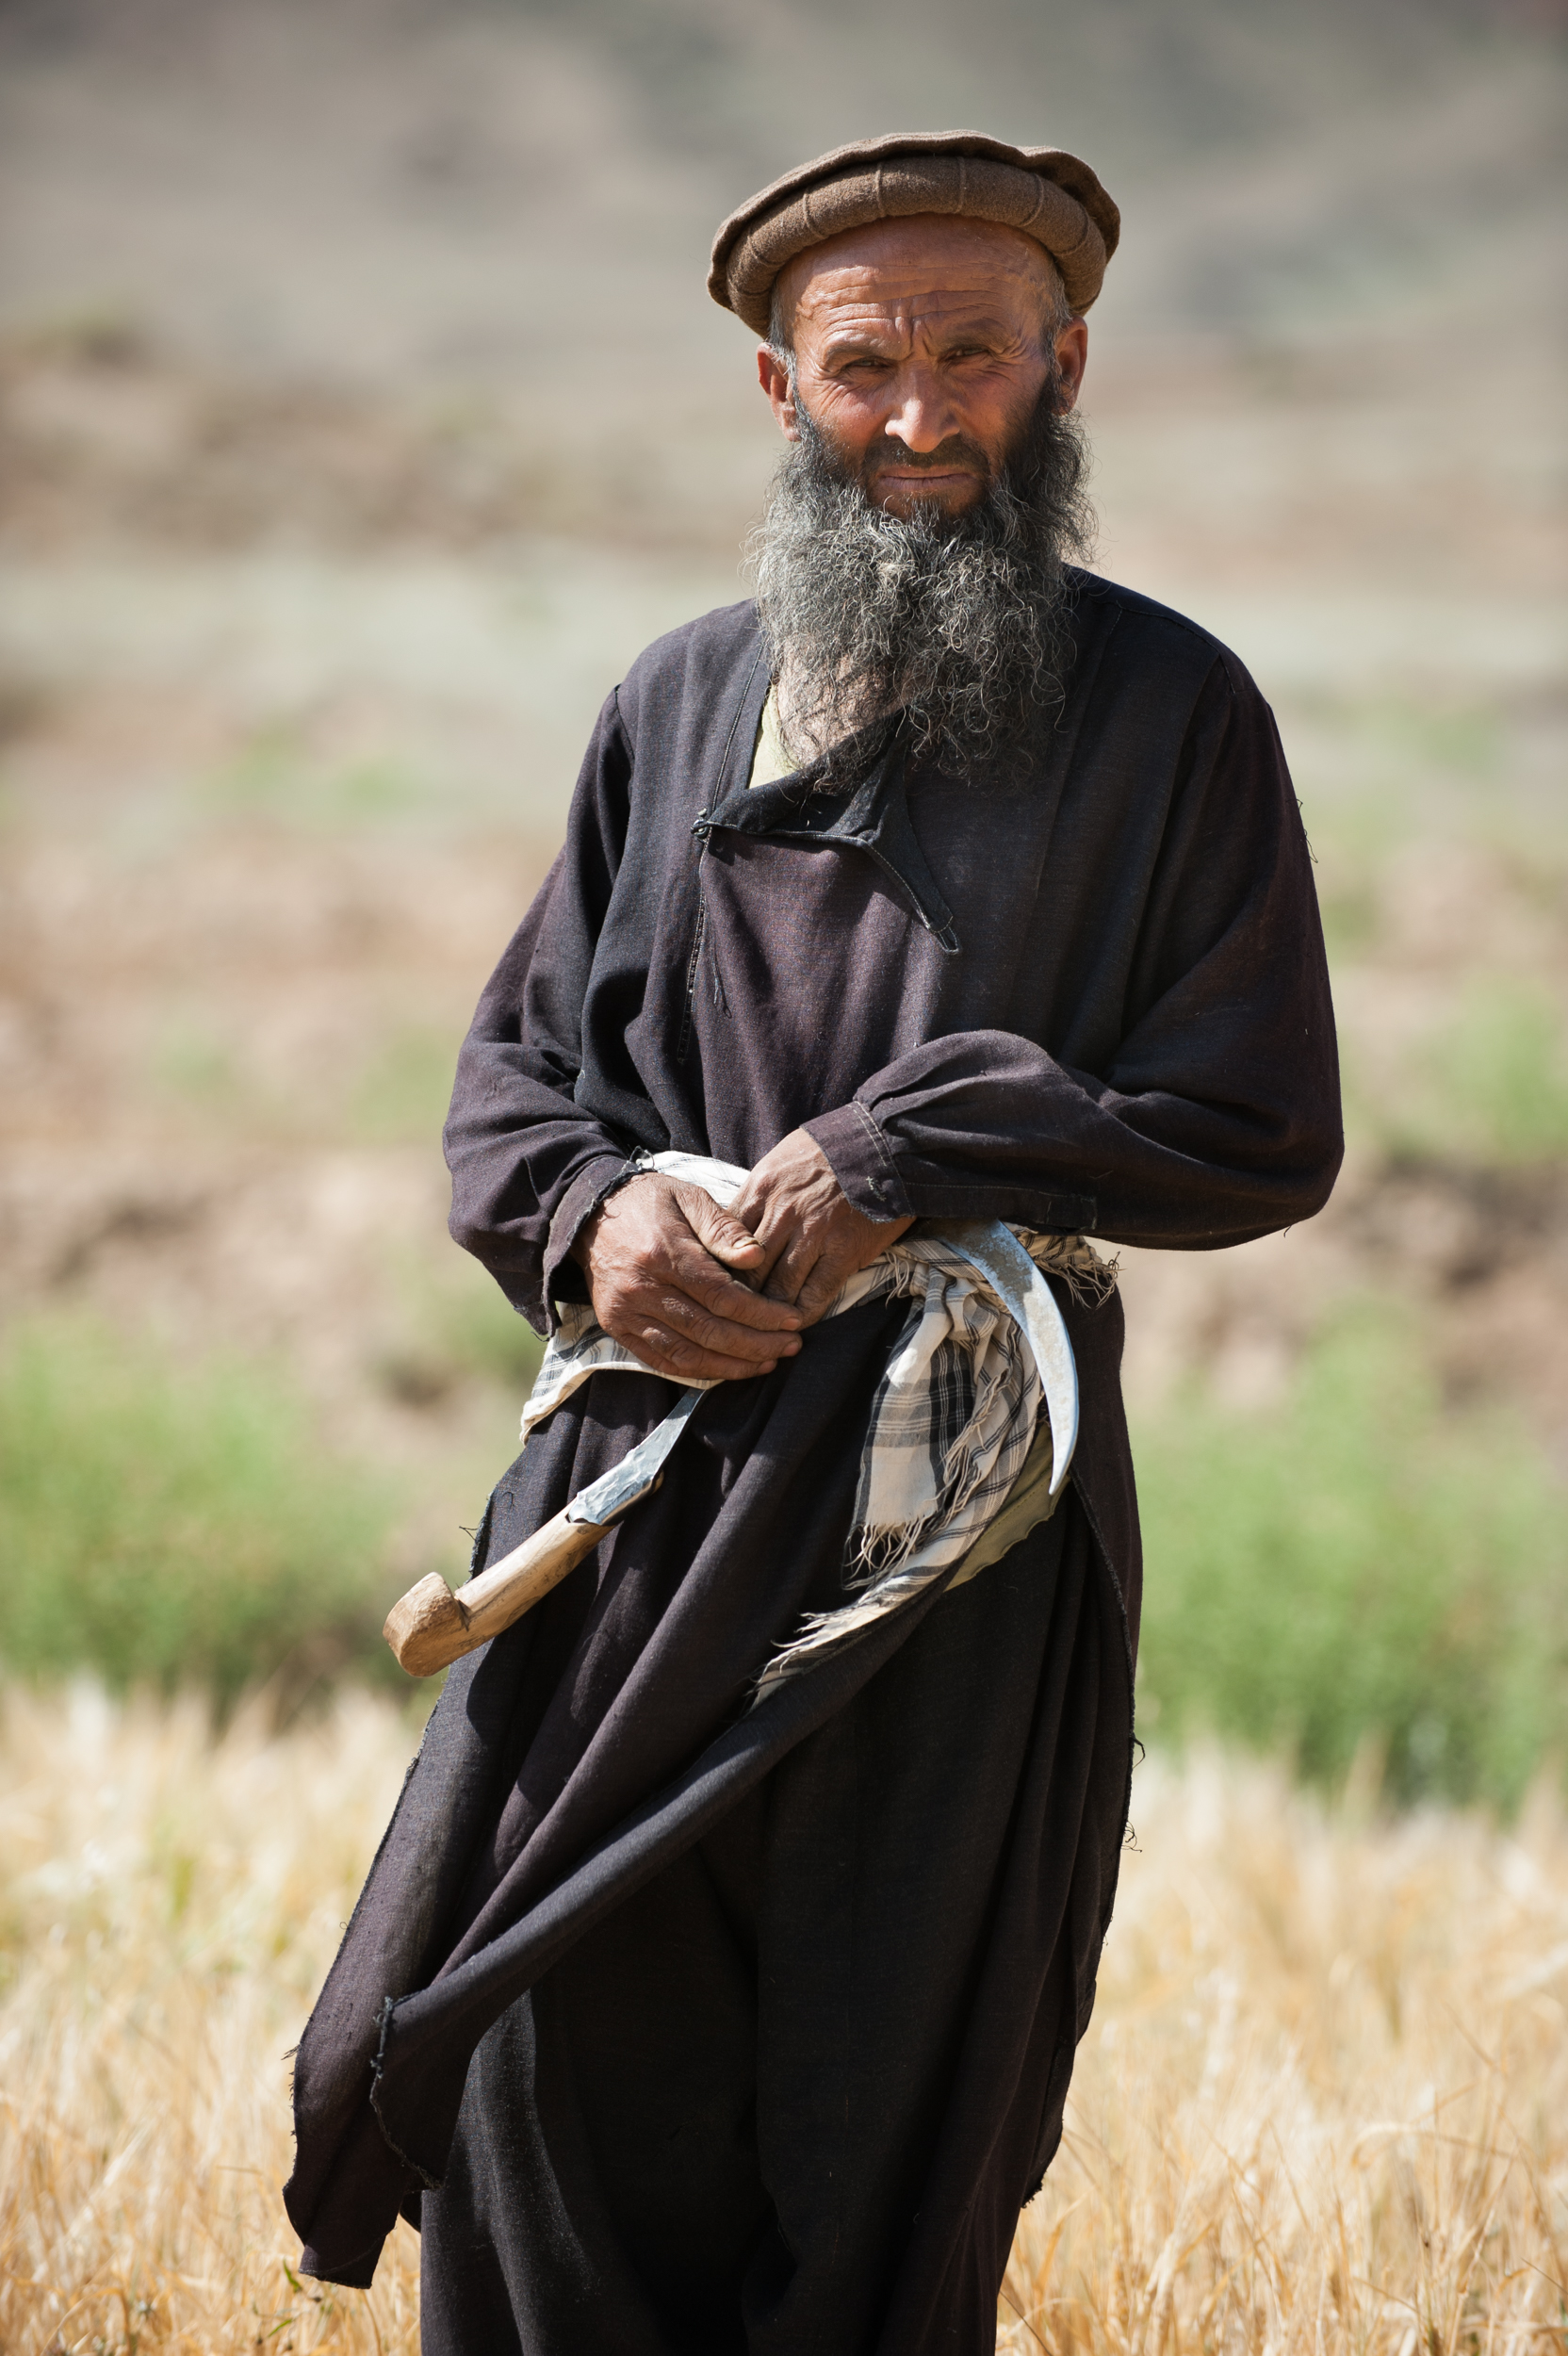 Wheat farmer in the Panjshir Valley _DSC6328.jpg